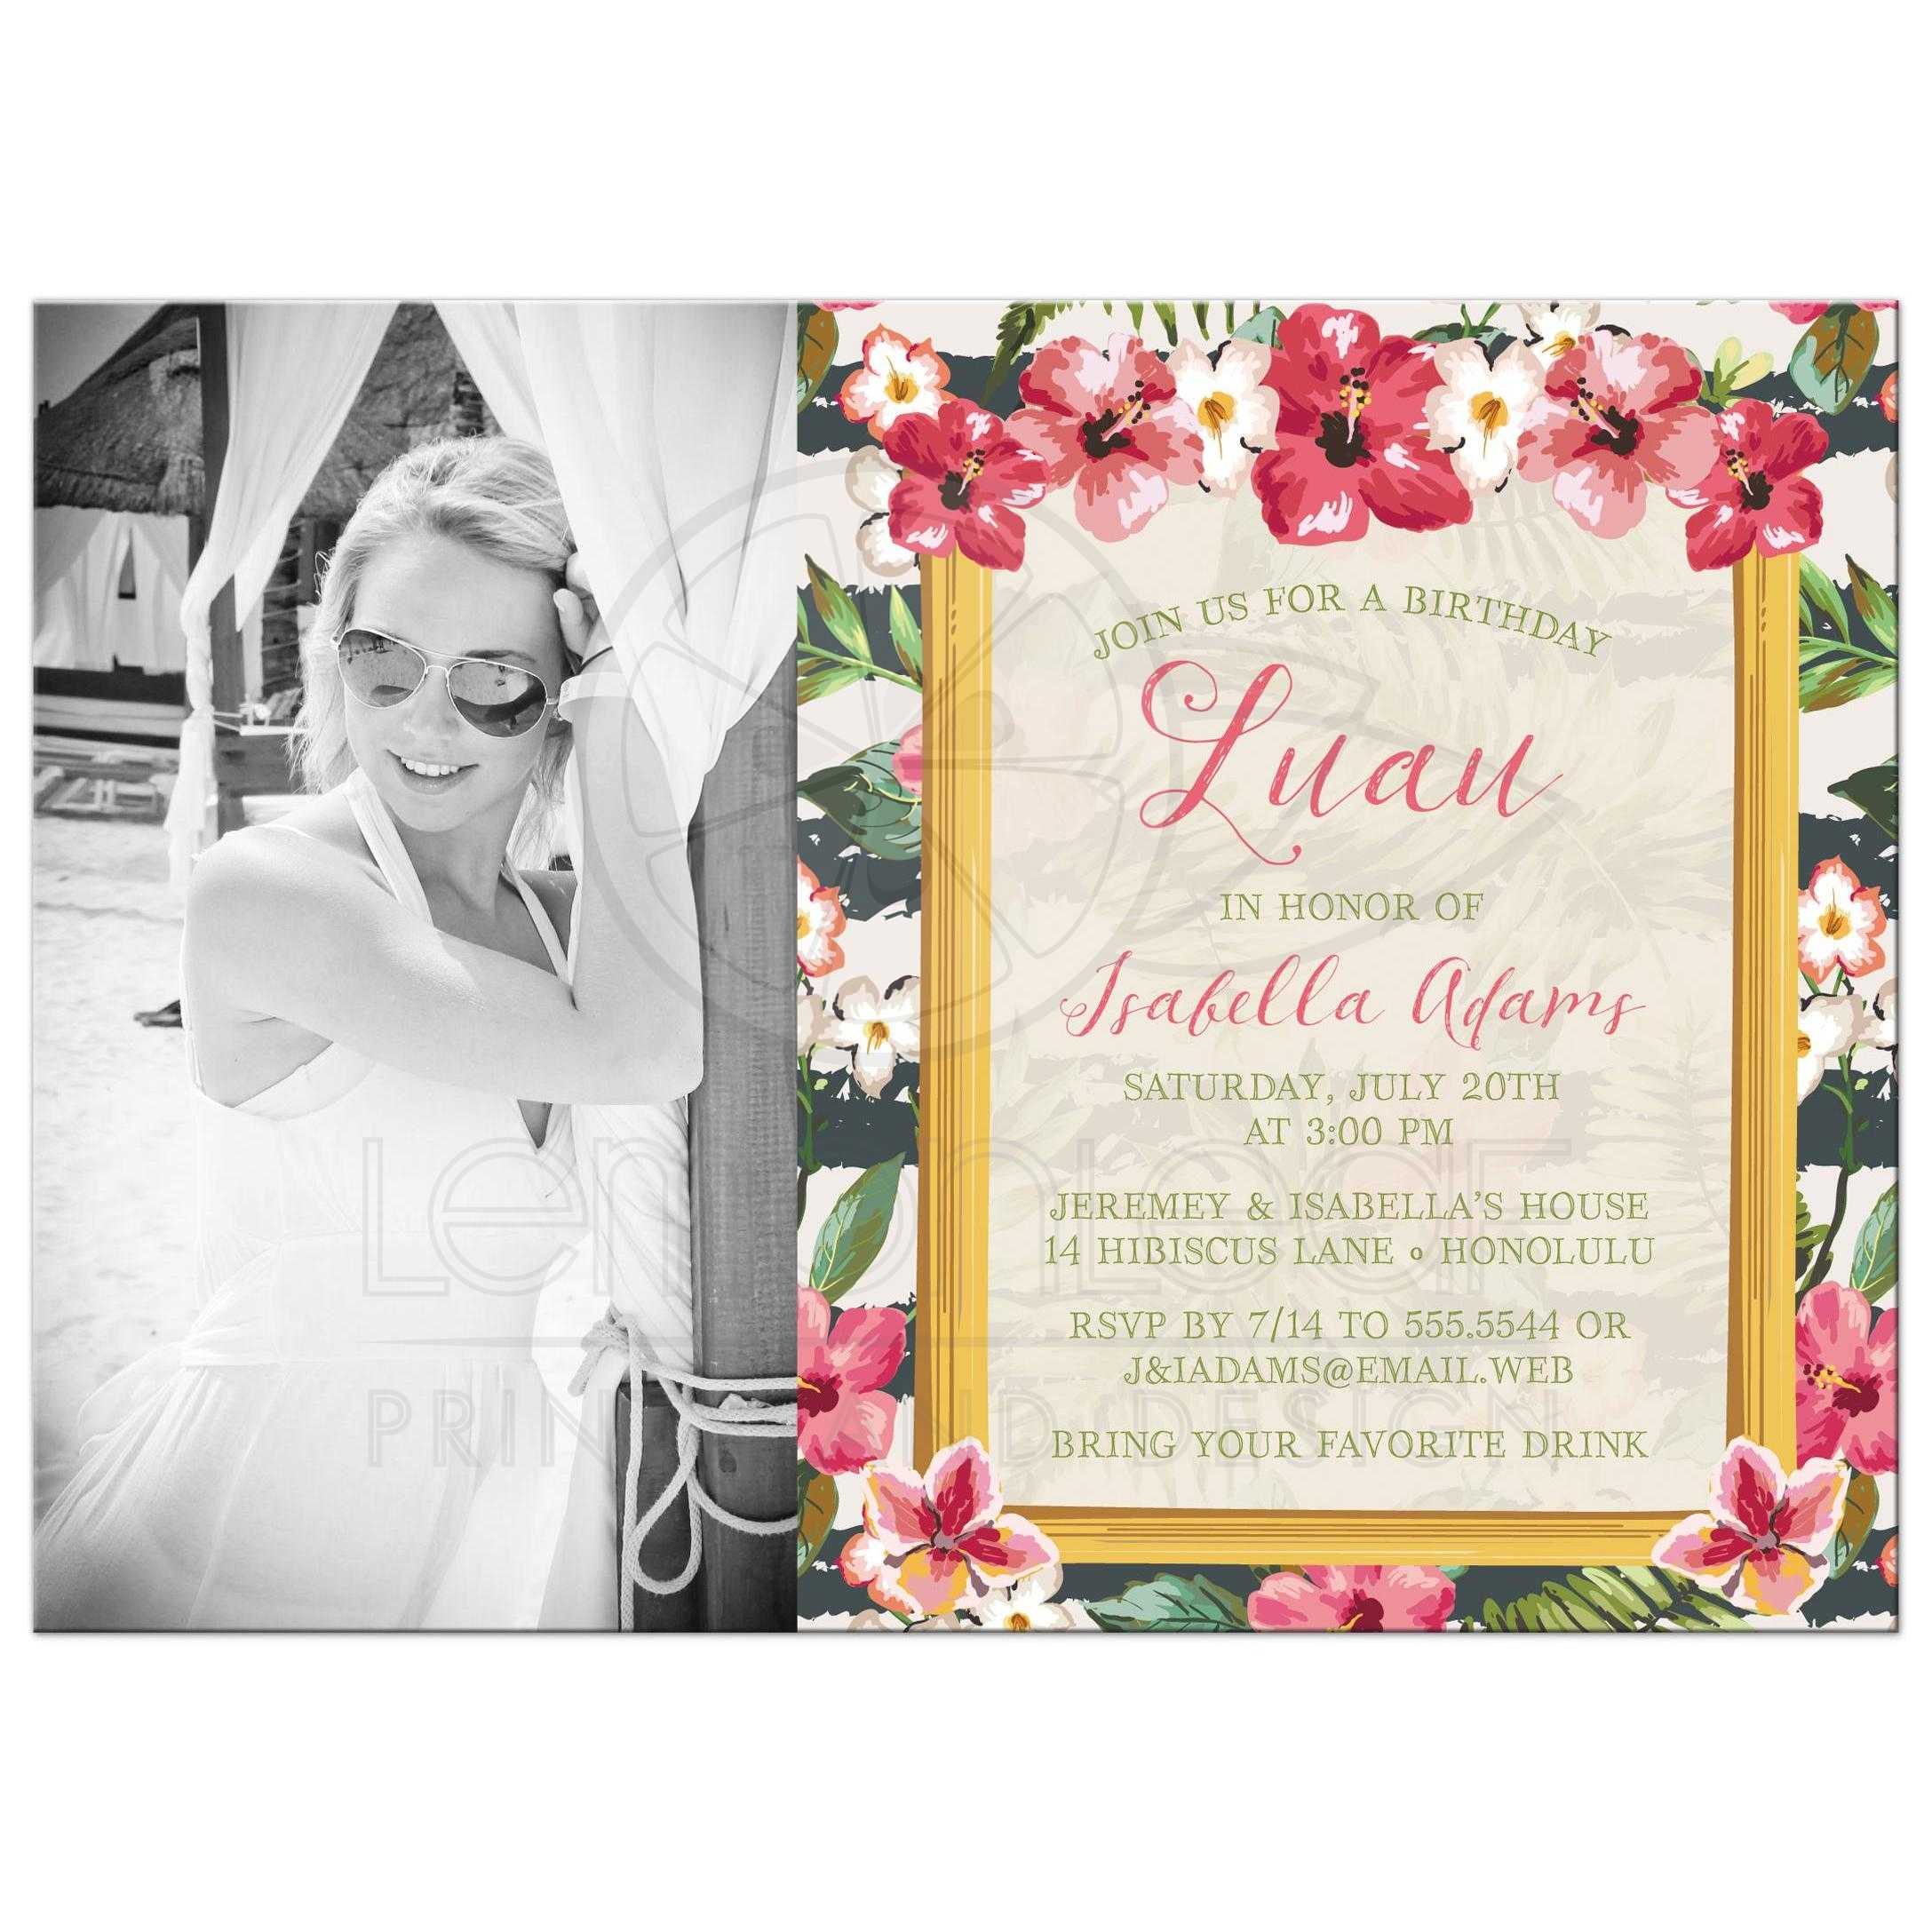 Luau Adult Birthday Party Photo Invitation Frangipani Hibiscus